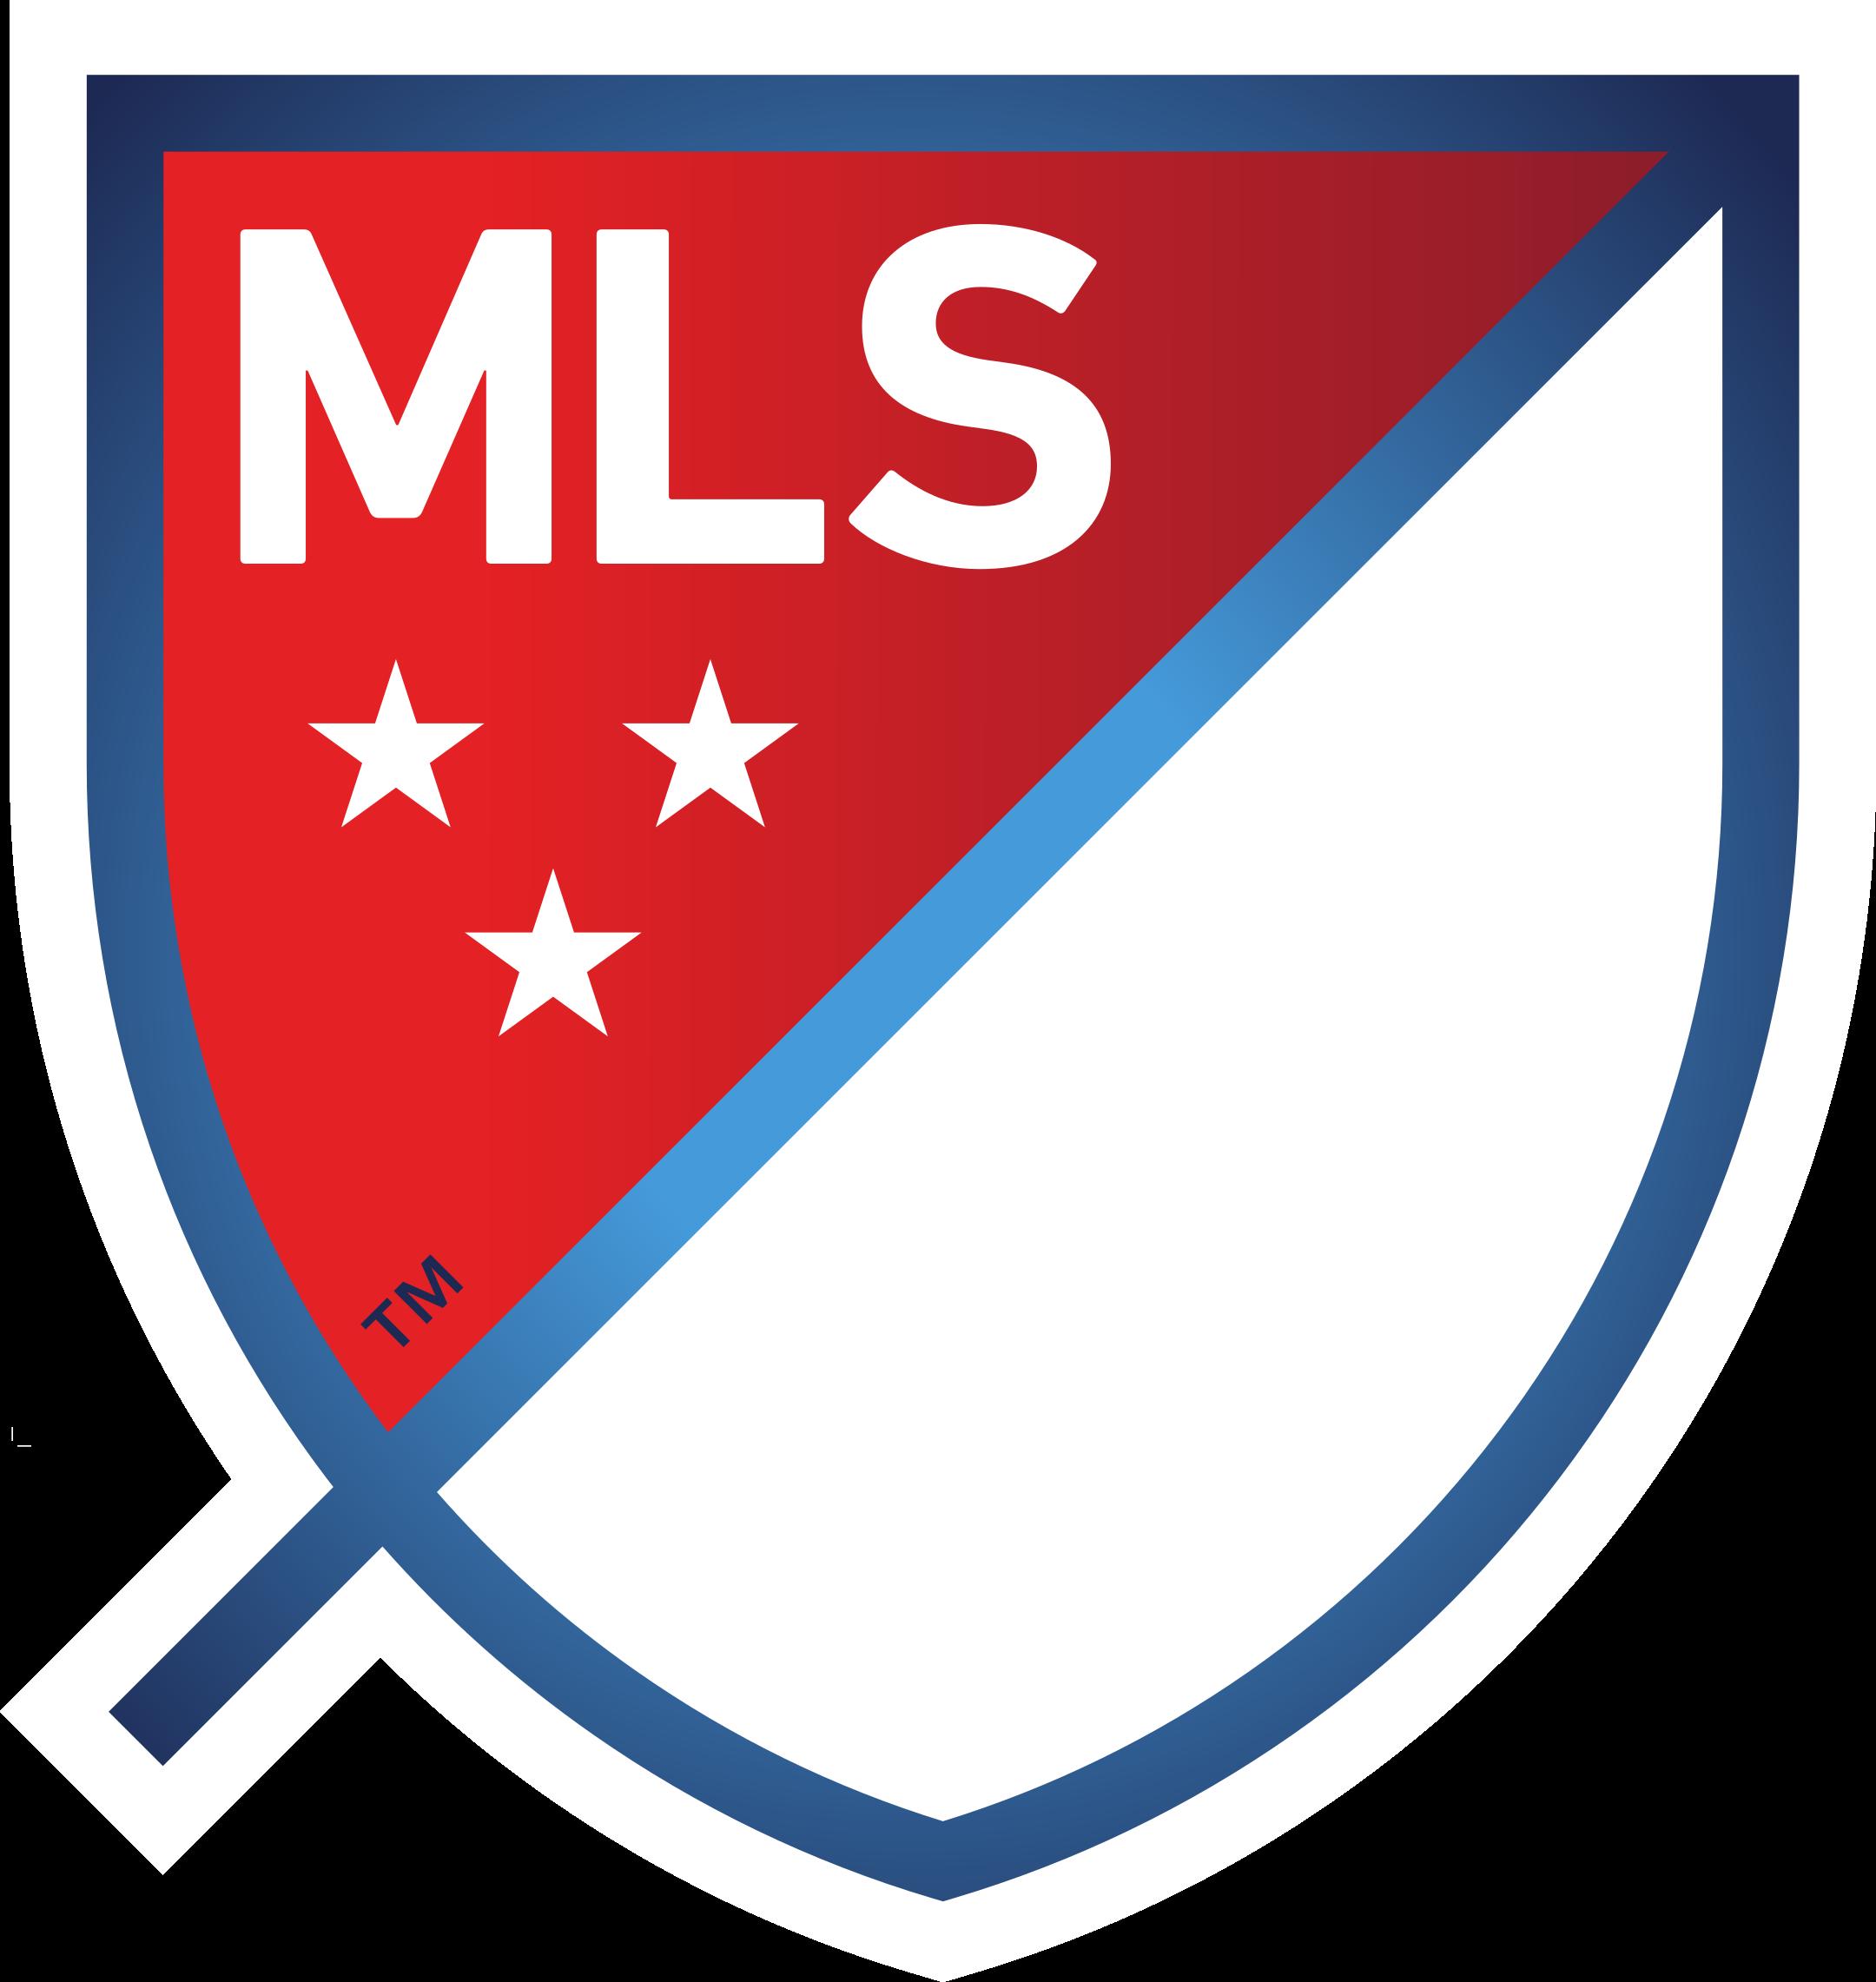 mls logo 1 - MLS Logo - Major League Soccer Logo